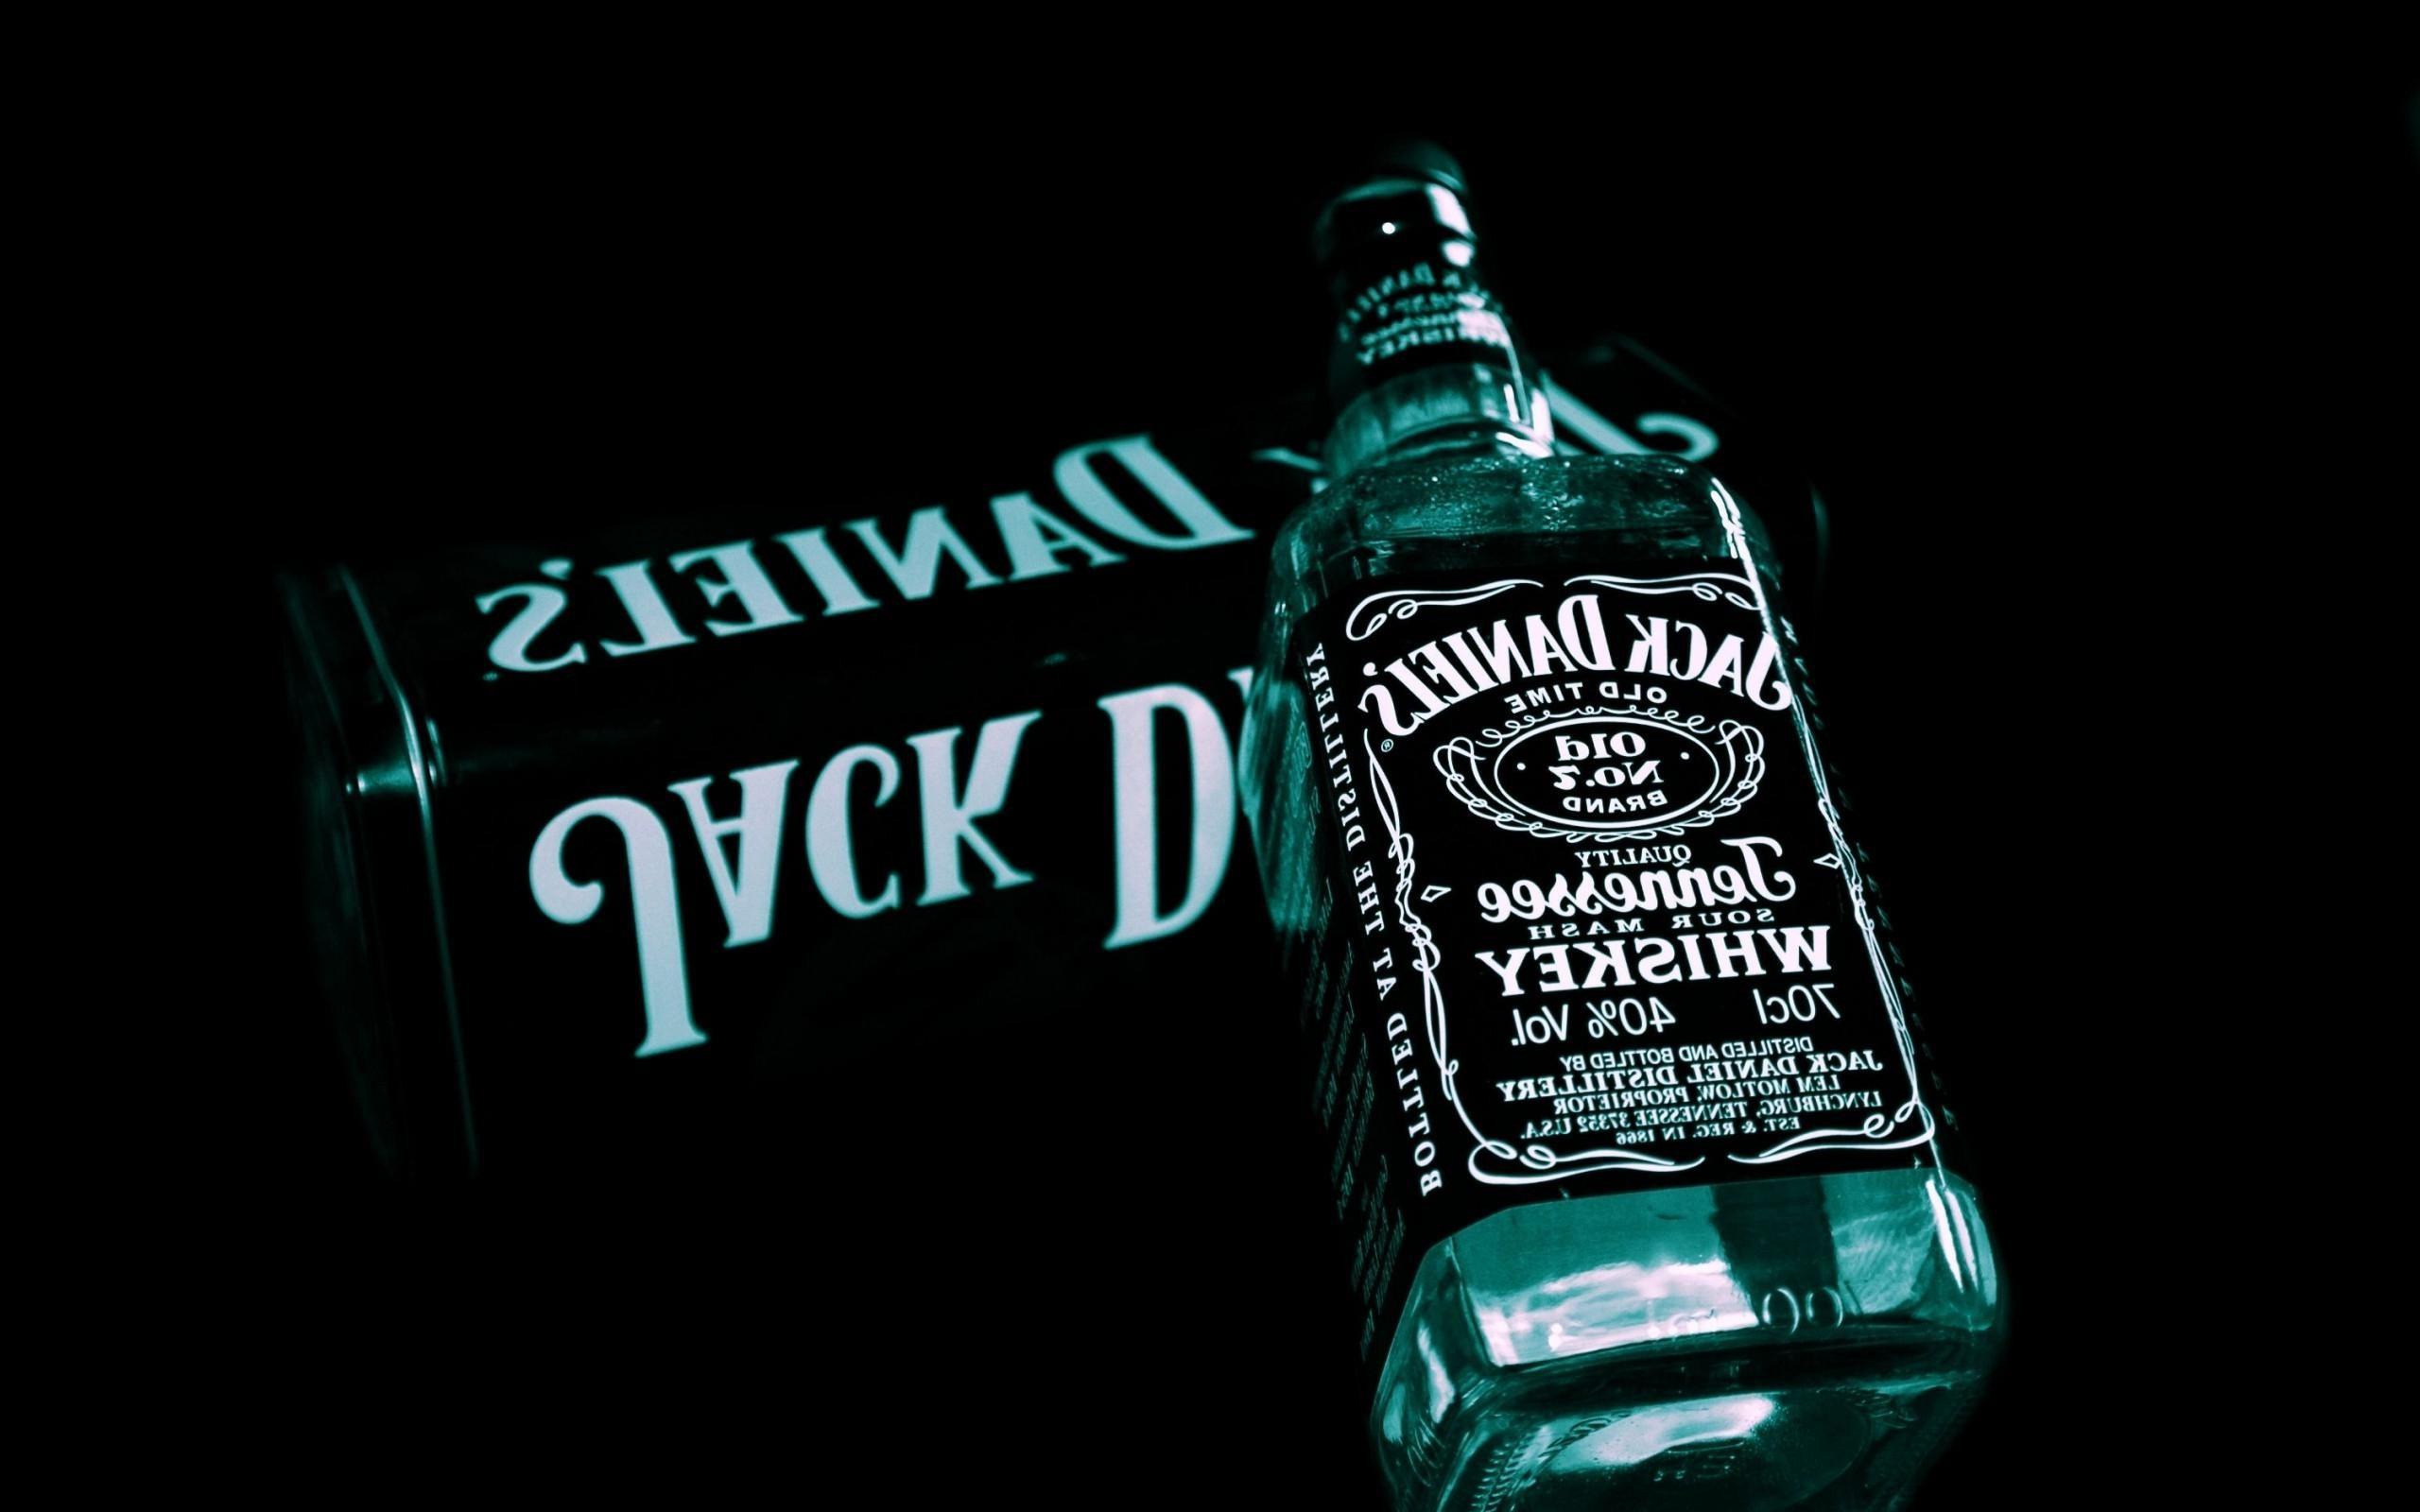 Pin de Mel' Harris em *~Jack * Daniels~*